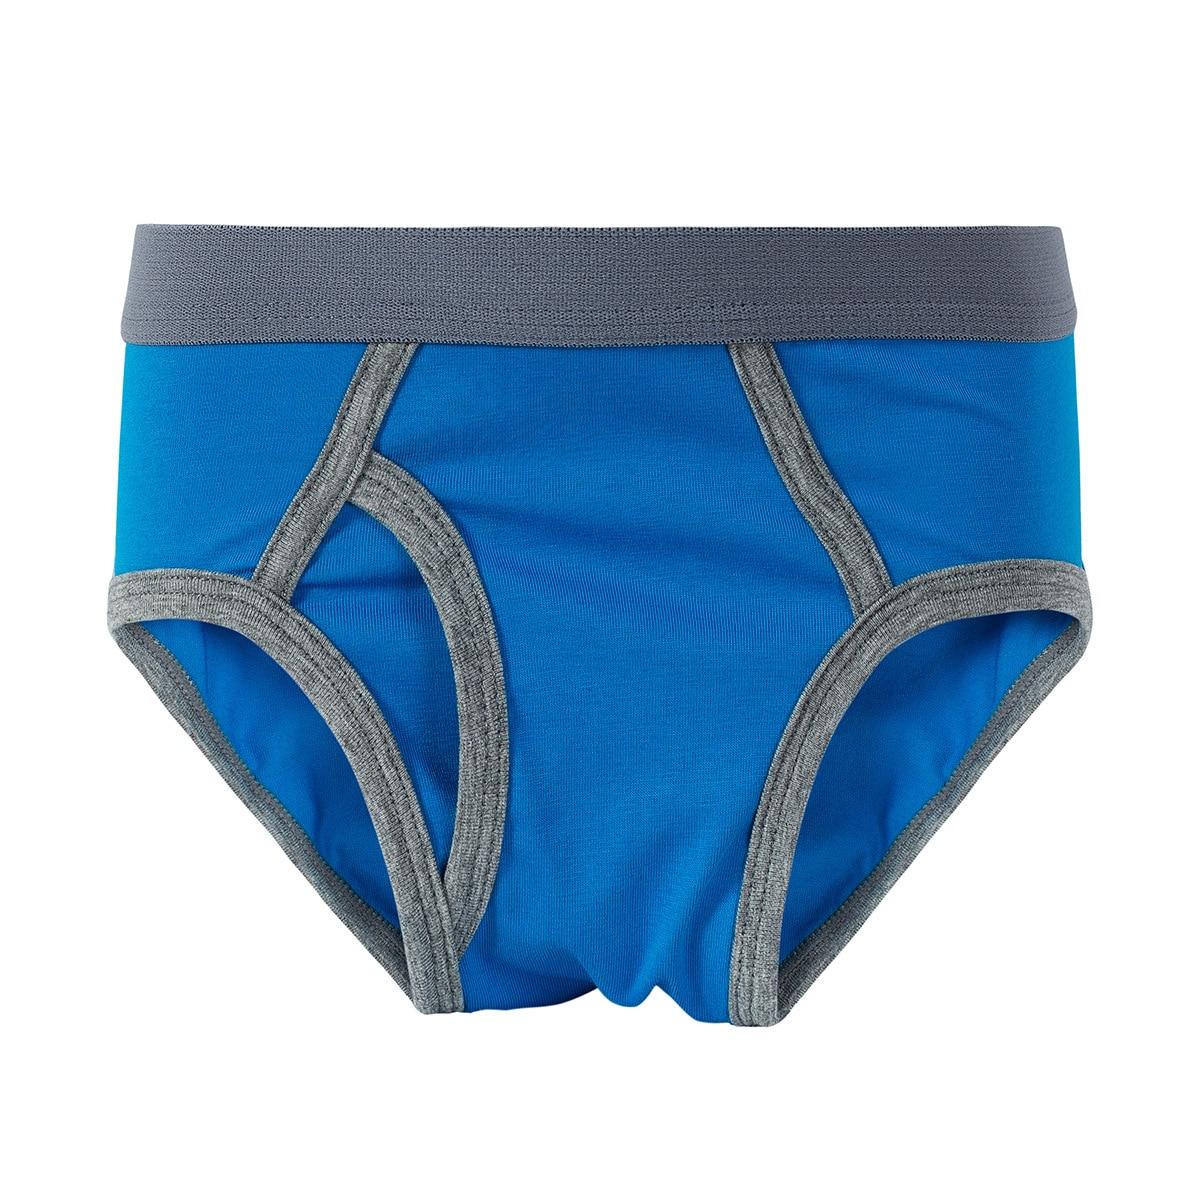 5pcs lot Solid Color Boy Panties Cotton Children Breathable Underwears Boxer Panties For Boys Kids Shorts Pants 2018 New panty